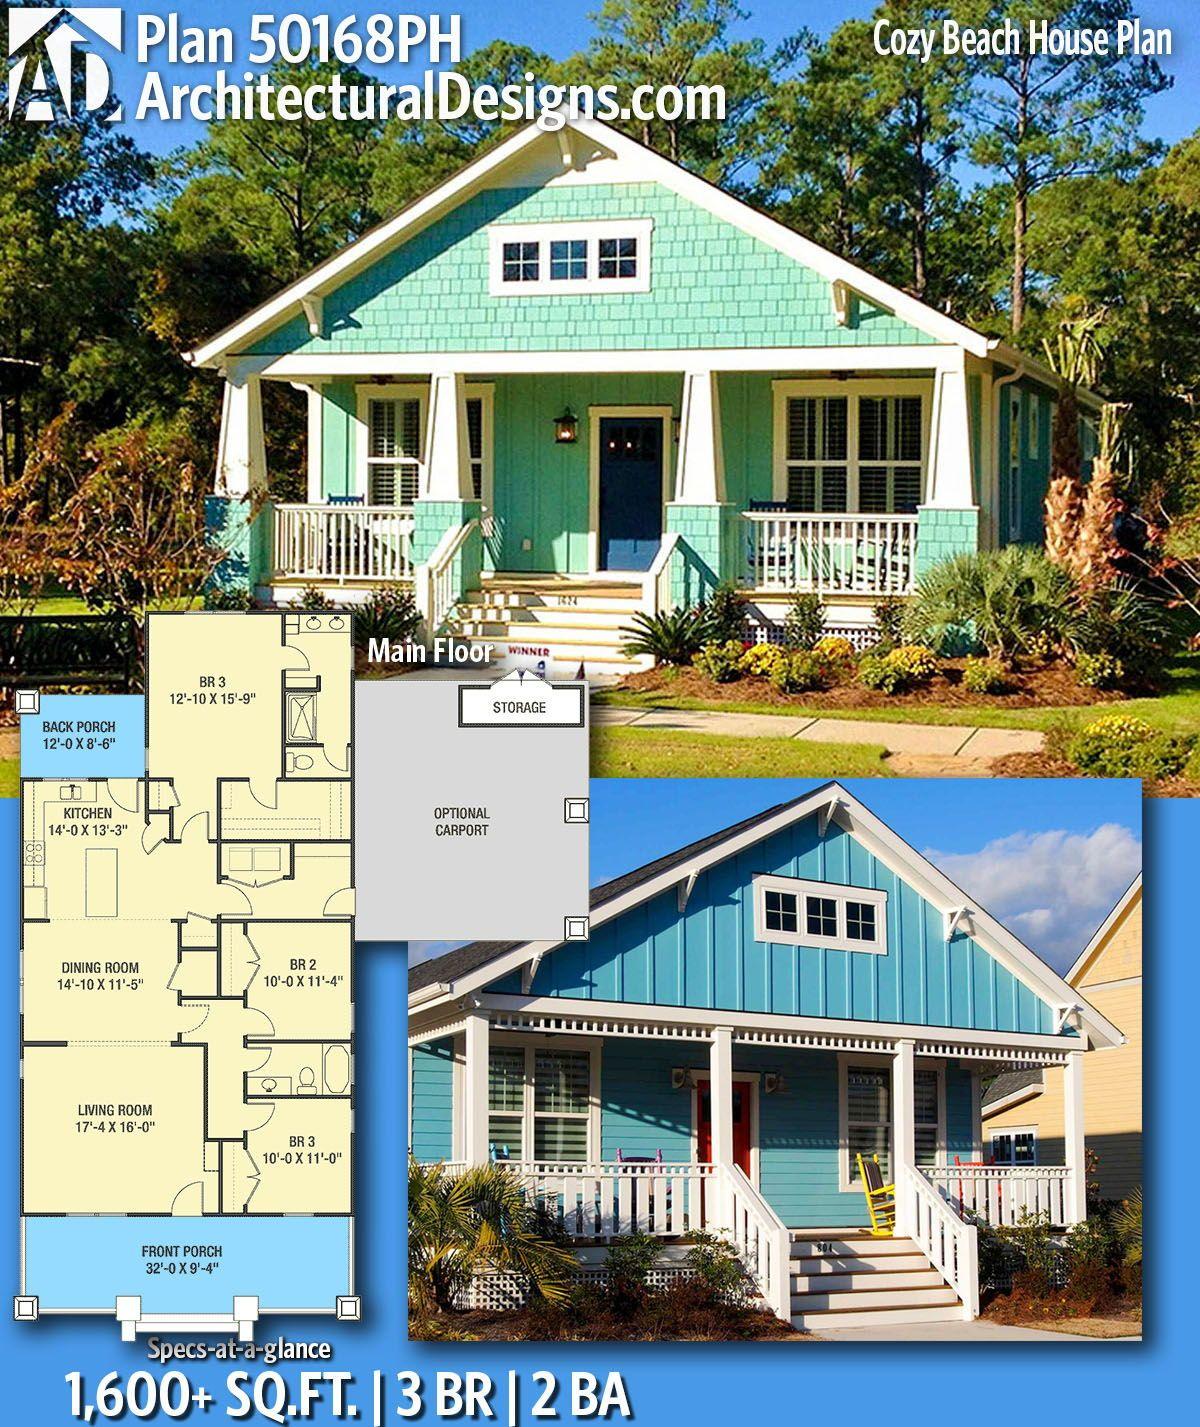 Plan 50168ph Cozy Beach House Plan With Optional Carport Beach House Plans Narrow Lot House Plans Beach House Plan